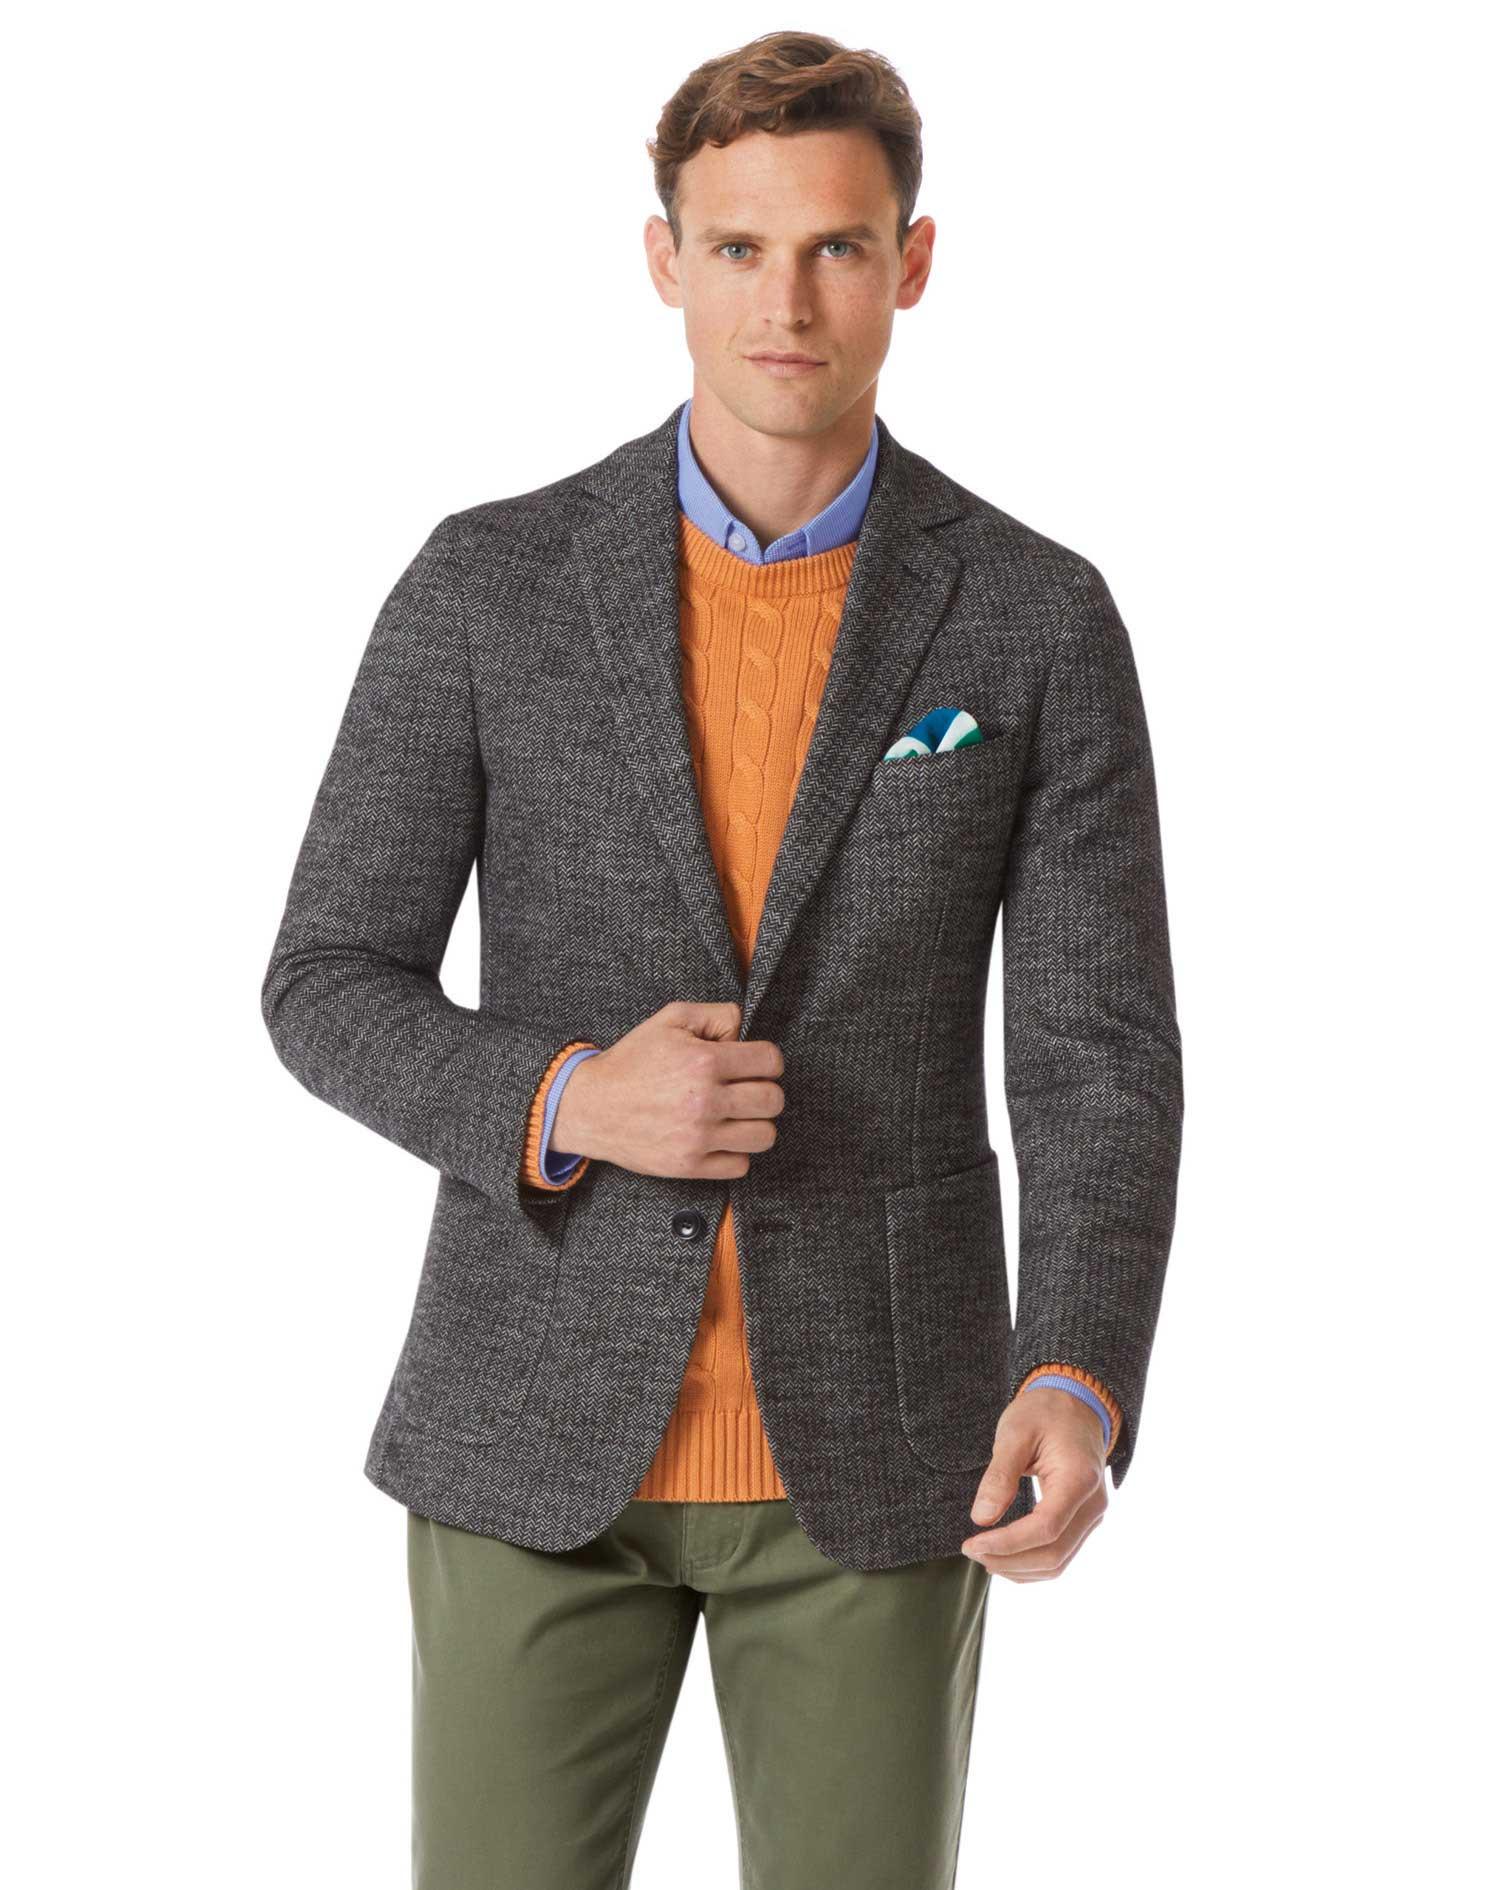 Slim Fit Black and White Stretch Wool Jacket Size 42 Regular by Charles Tyrwhitt